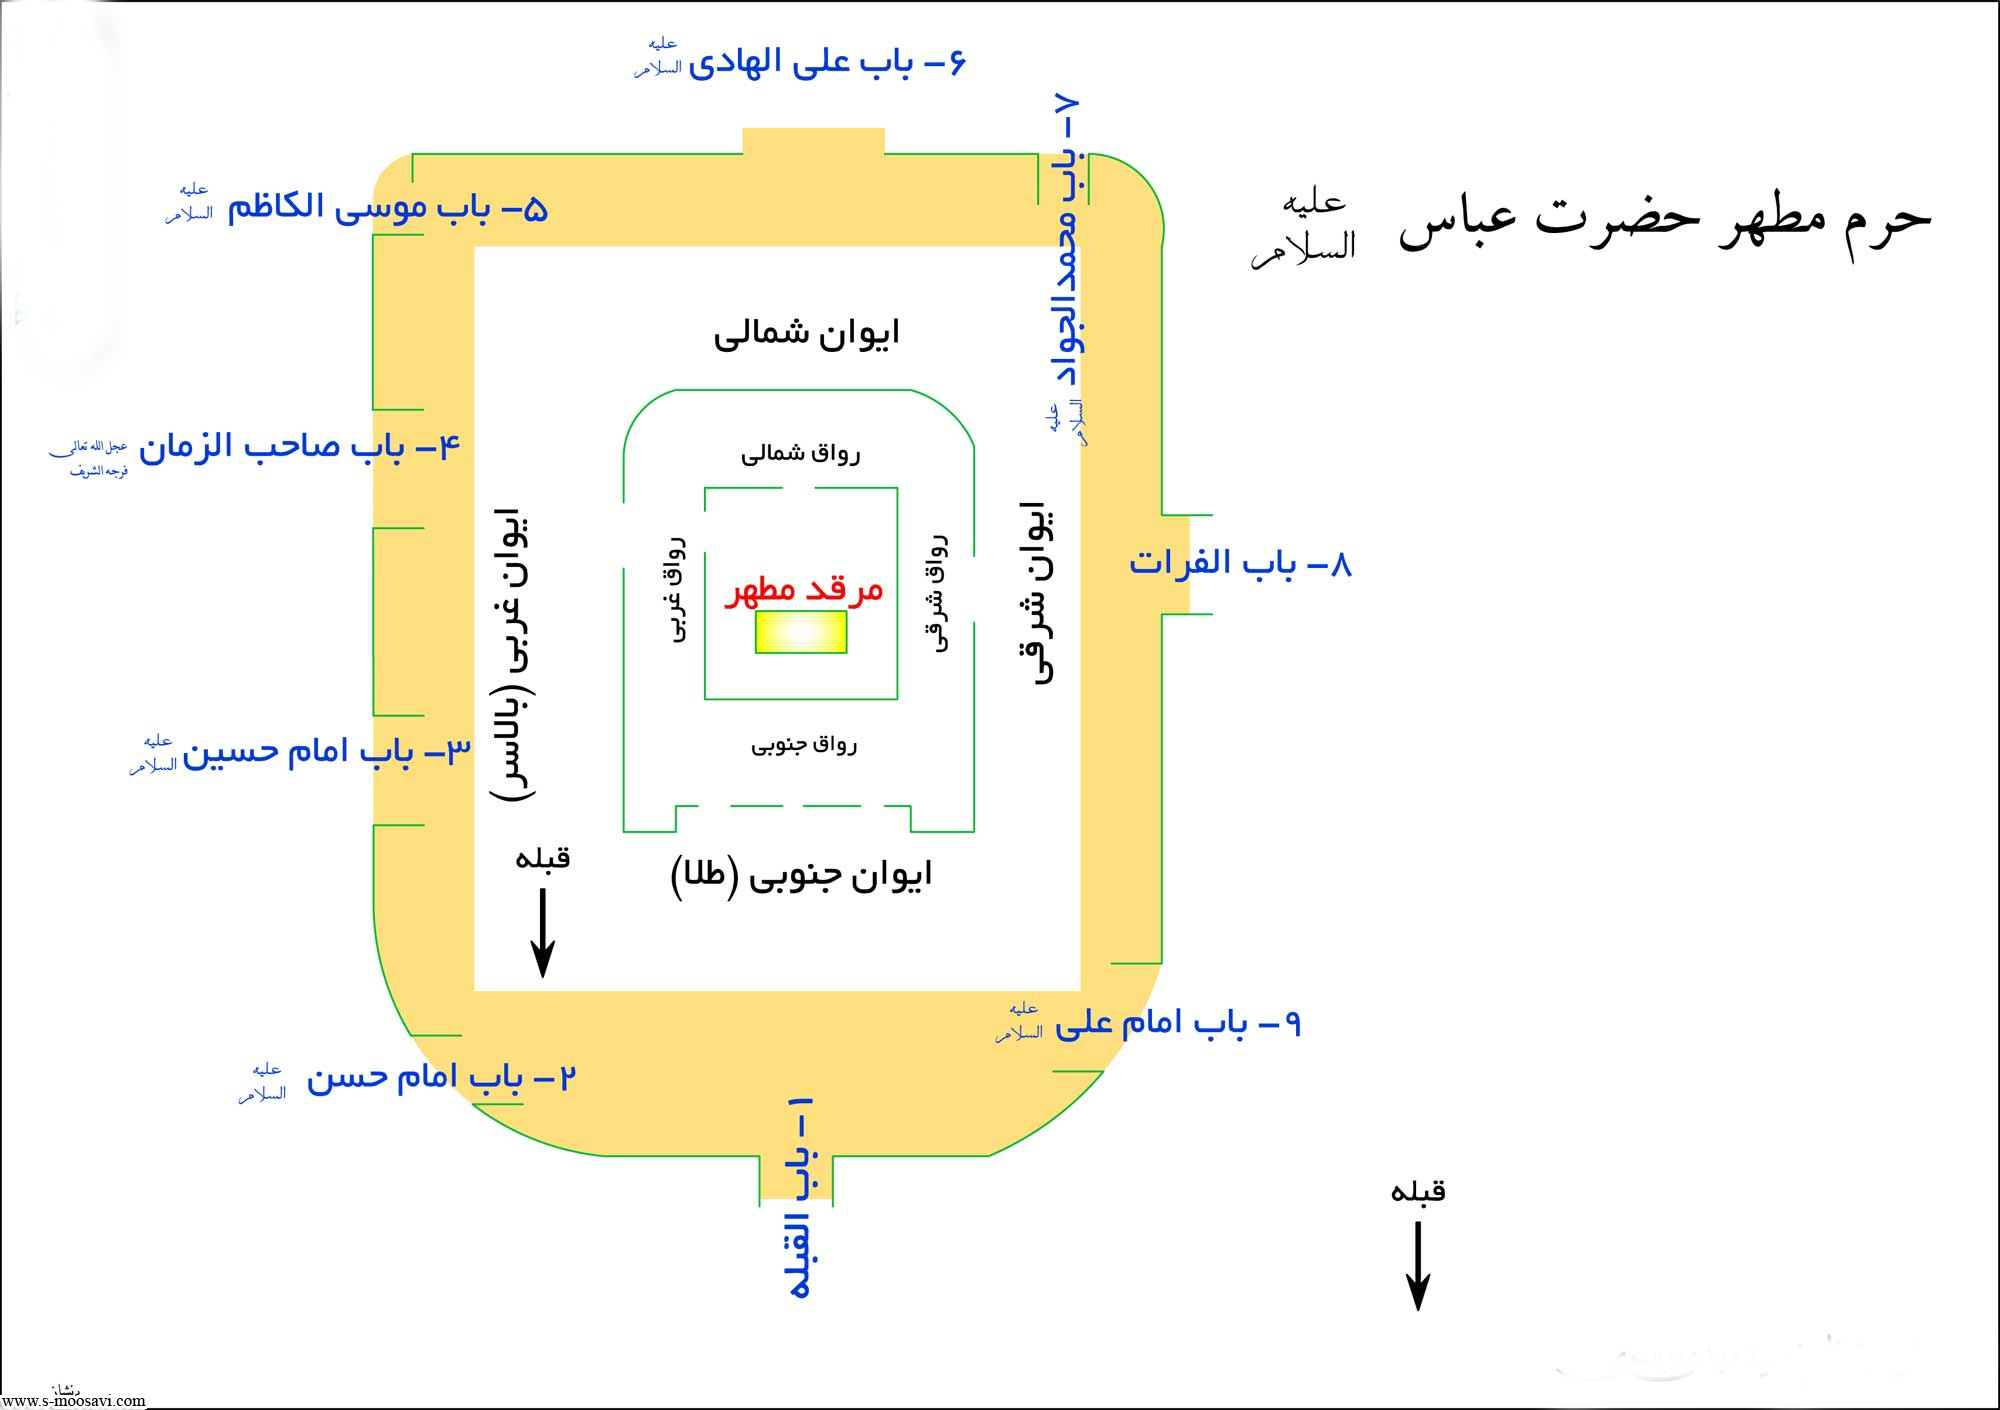 نقشه حرم حضرت عباس علیه السلام